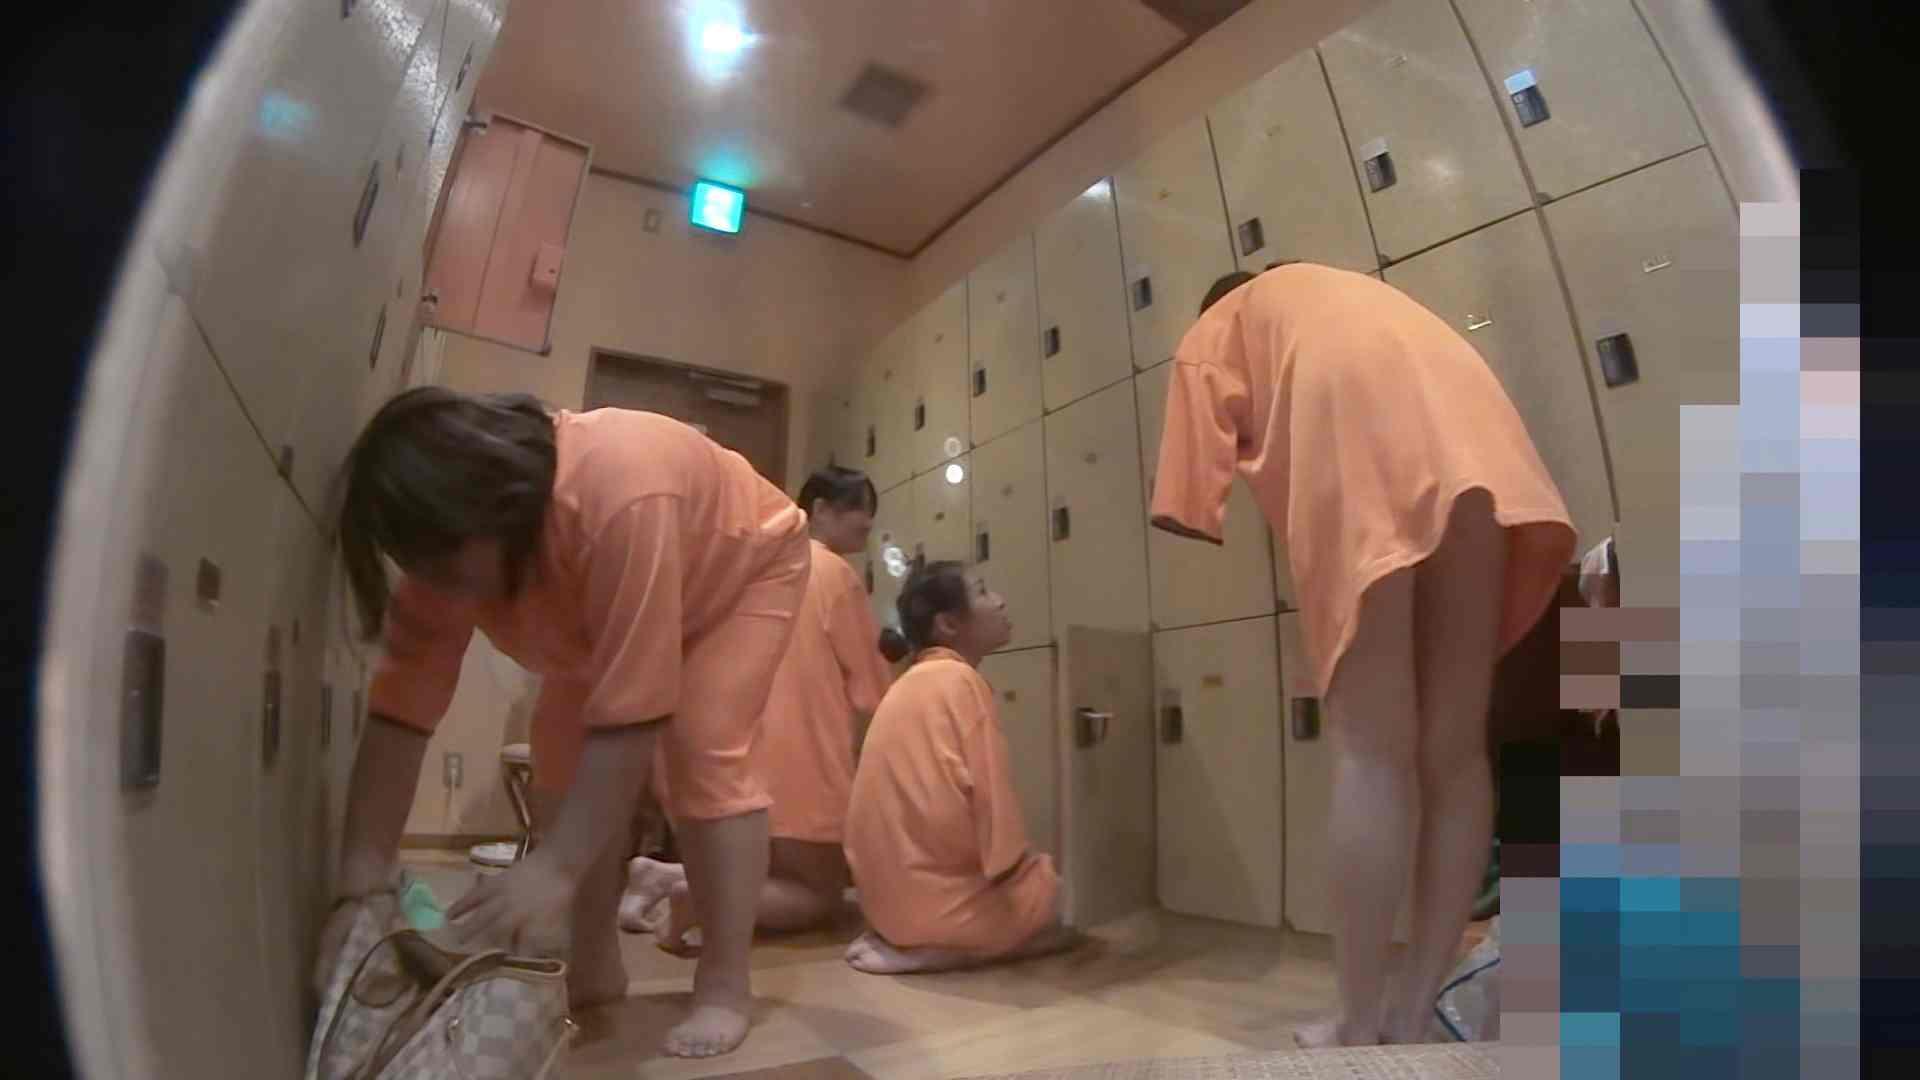 TG.06 「せーの!」で脱ぐ若草仲良し5人組 盗撮 セックス画像 90枚 26